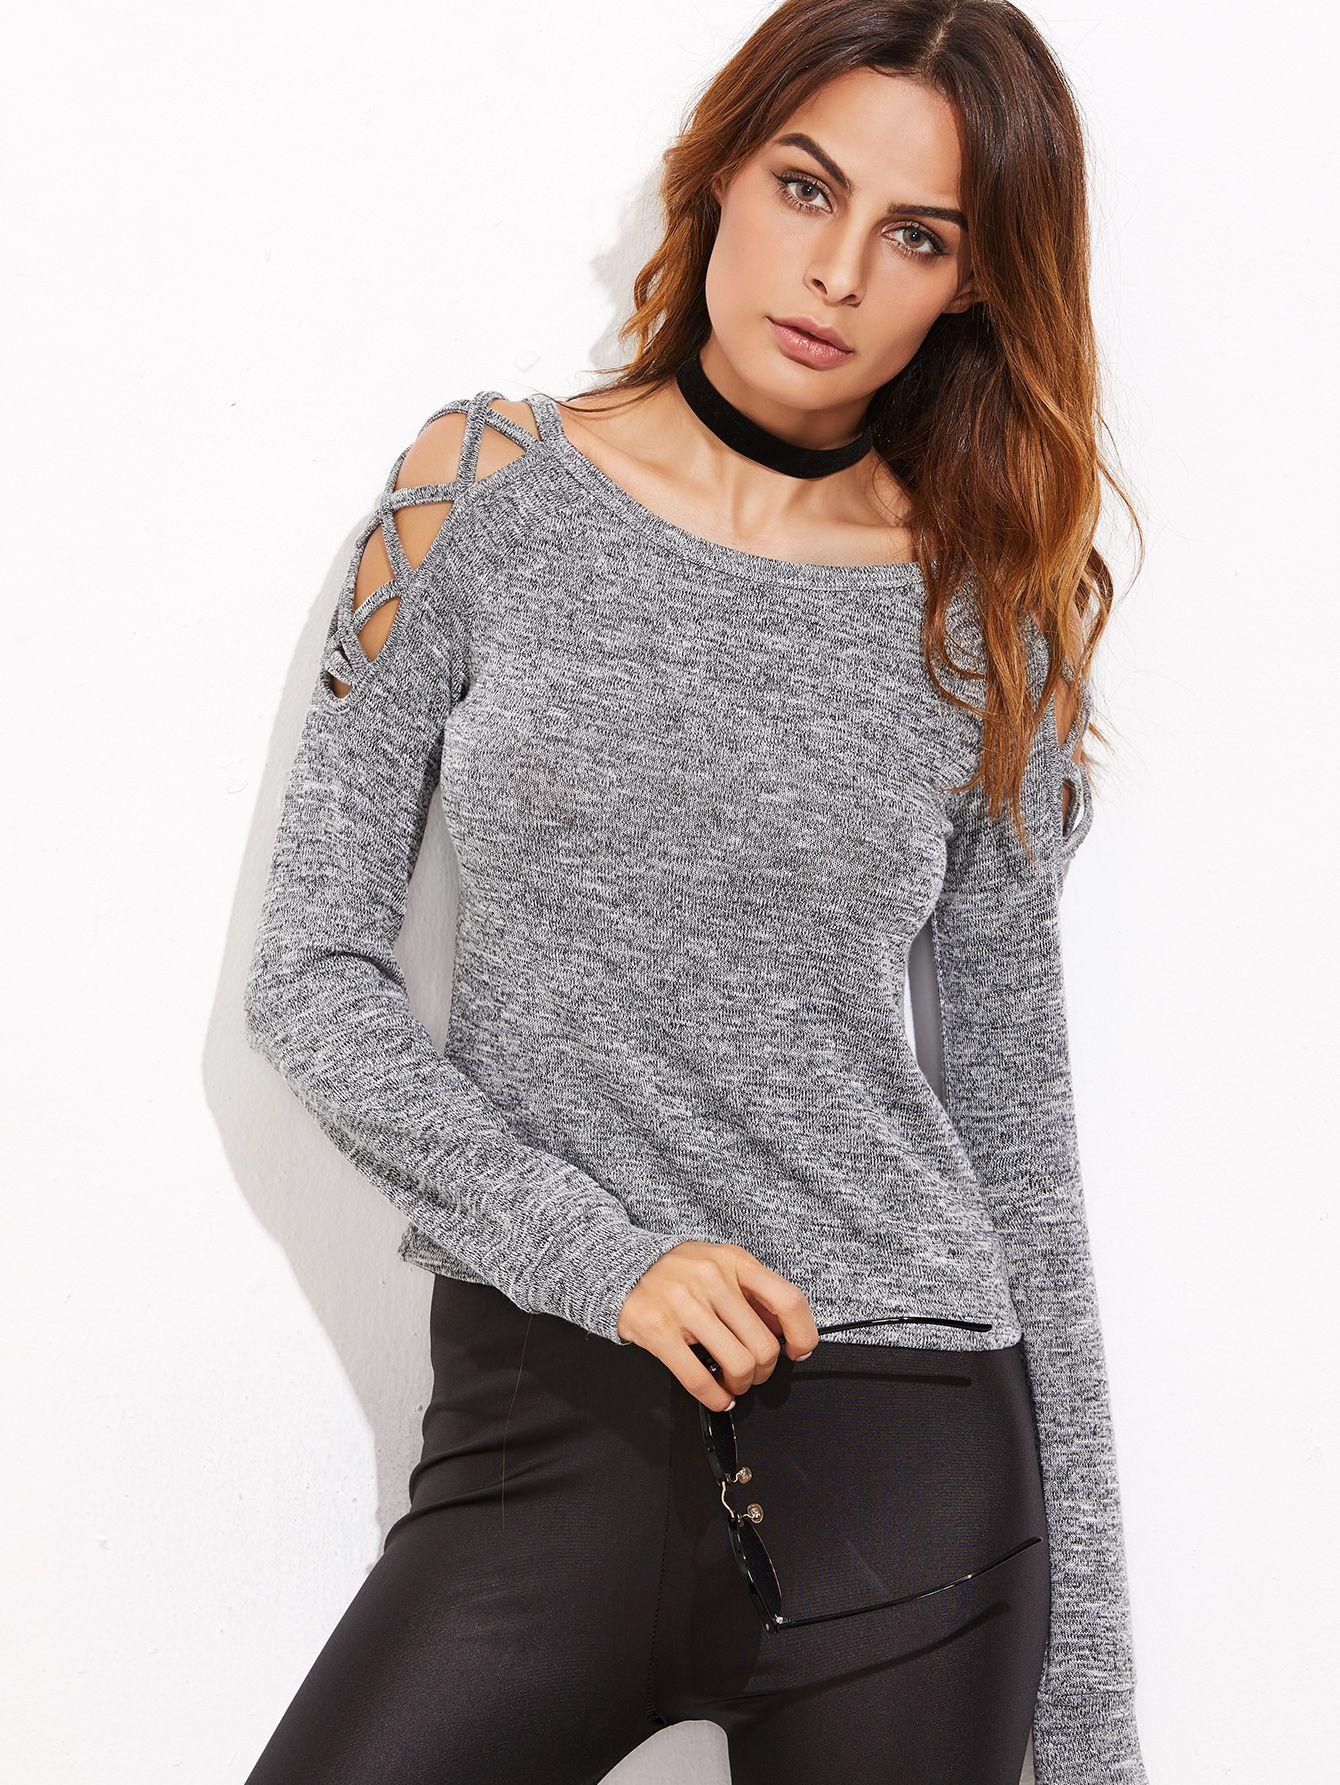 953f6bb951 Grey Marled Crisscross Open Shoulder T-shirt   MakeMeChic.COM Mobile Site